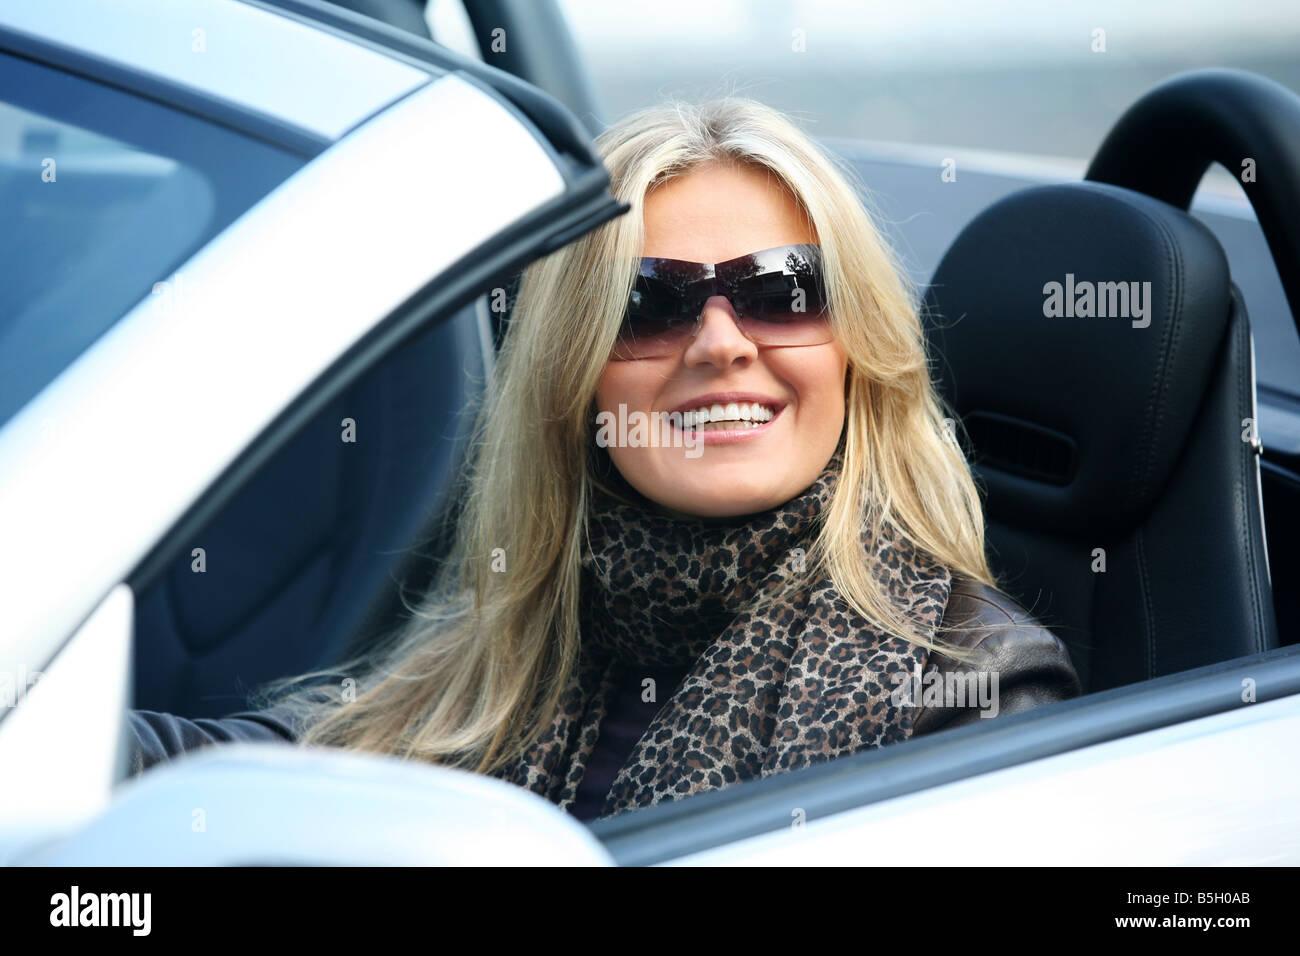 Kourtney Blonde Mädchen fahren fickt